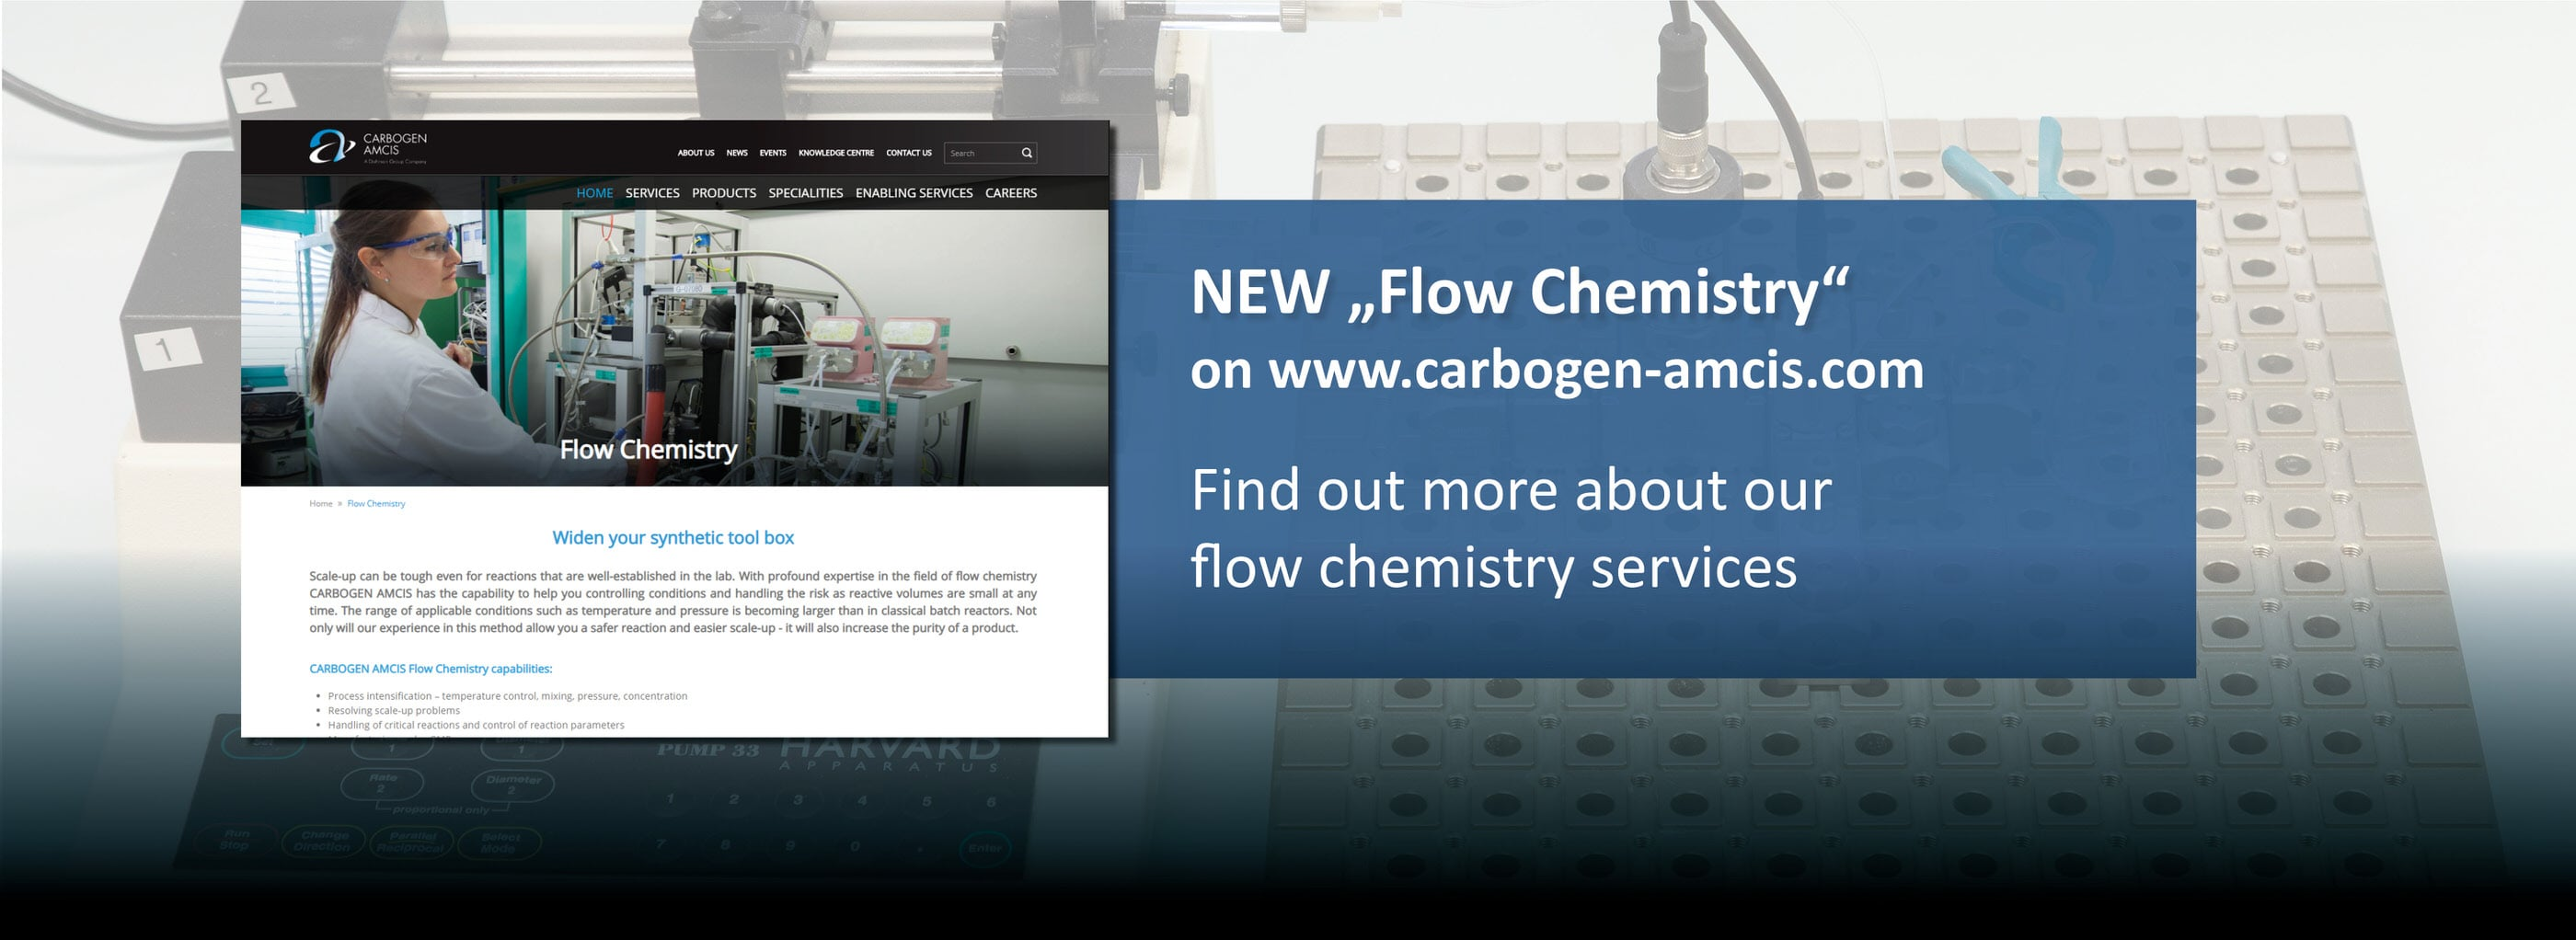 Flow_Chemistry_Webpage3